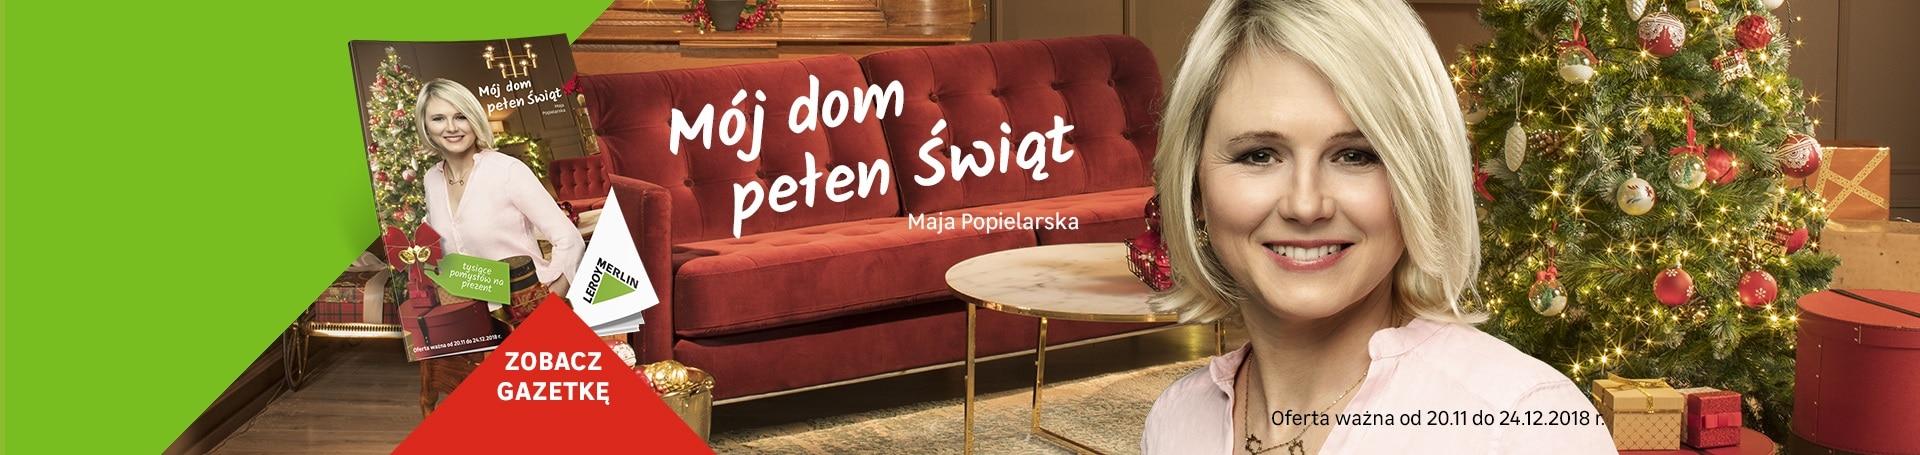 sk-gazetka-20.11-24.12.2018-1920x455